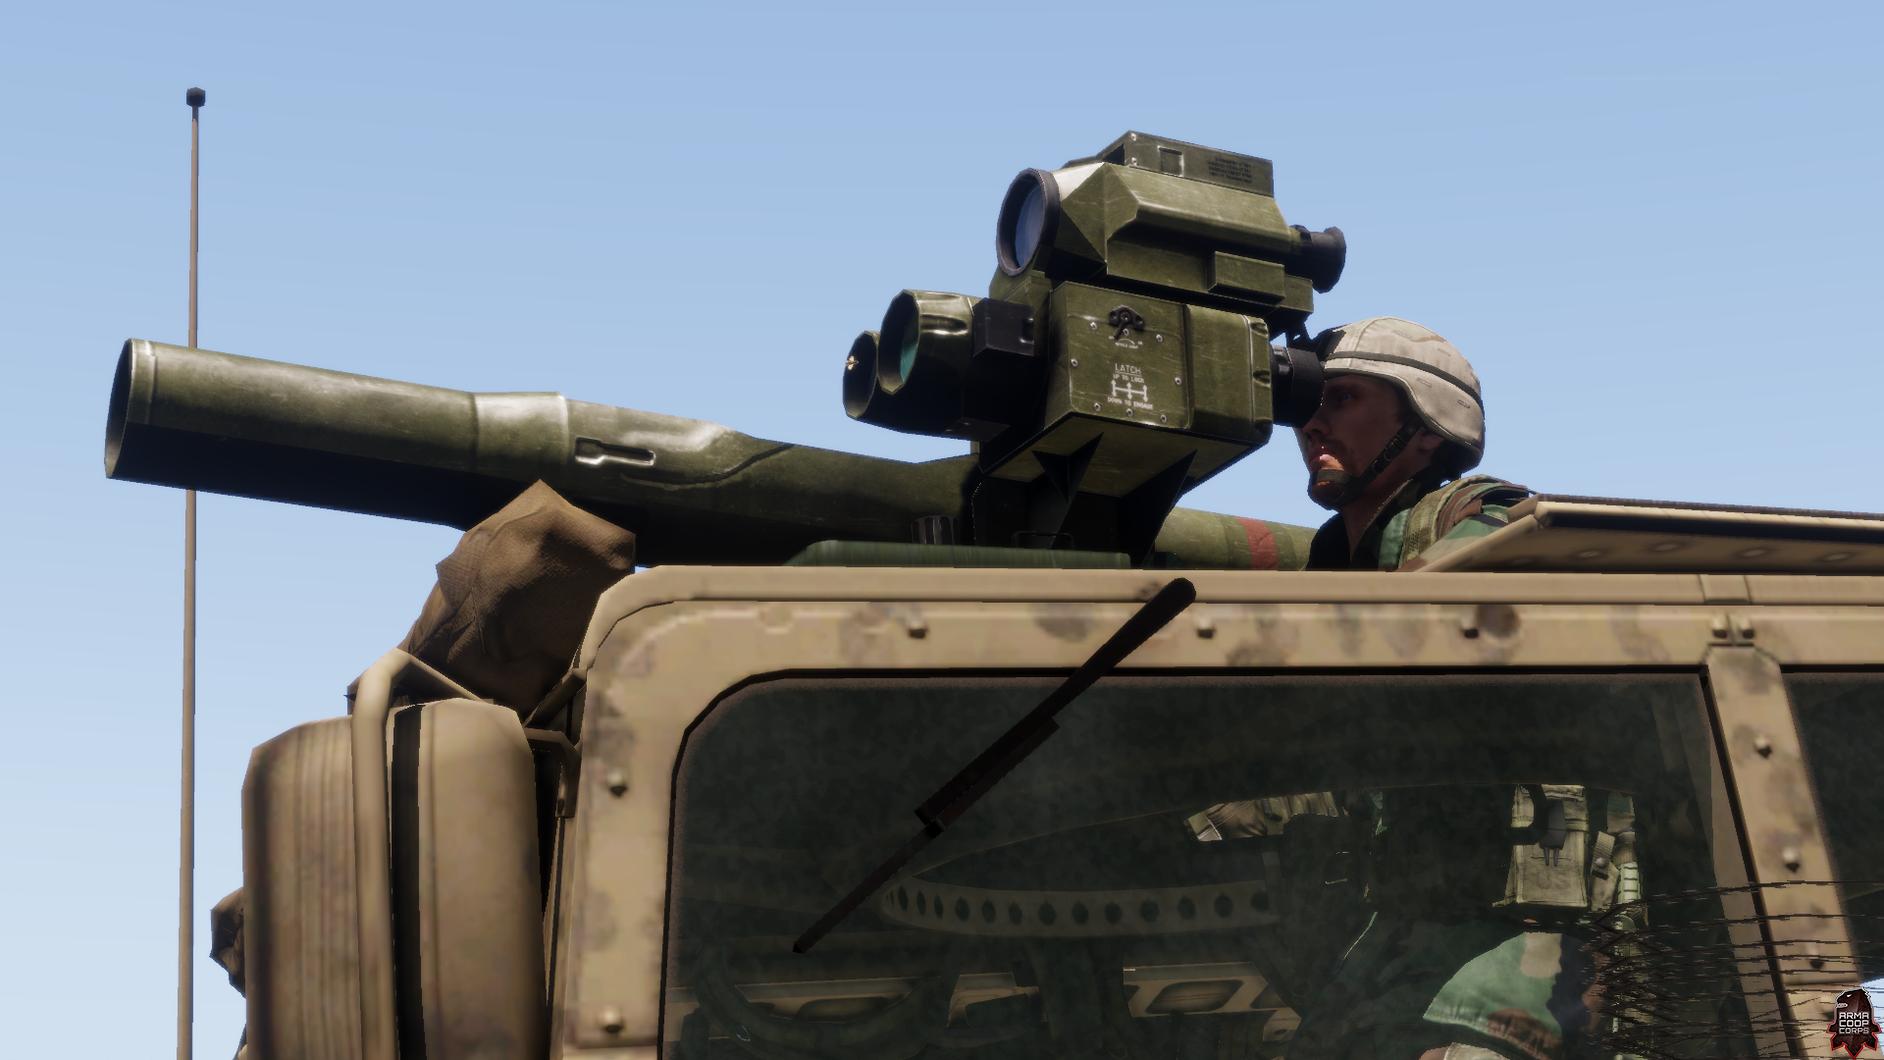 ArmA 3 Screenshot 2020.04.24 - 21.21.17.87.png